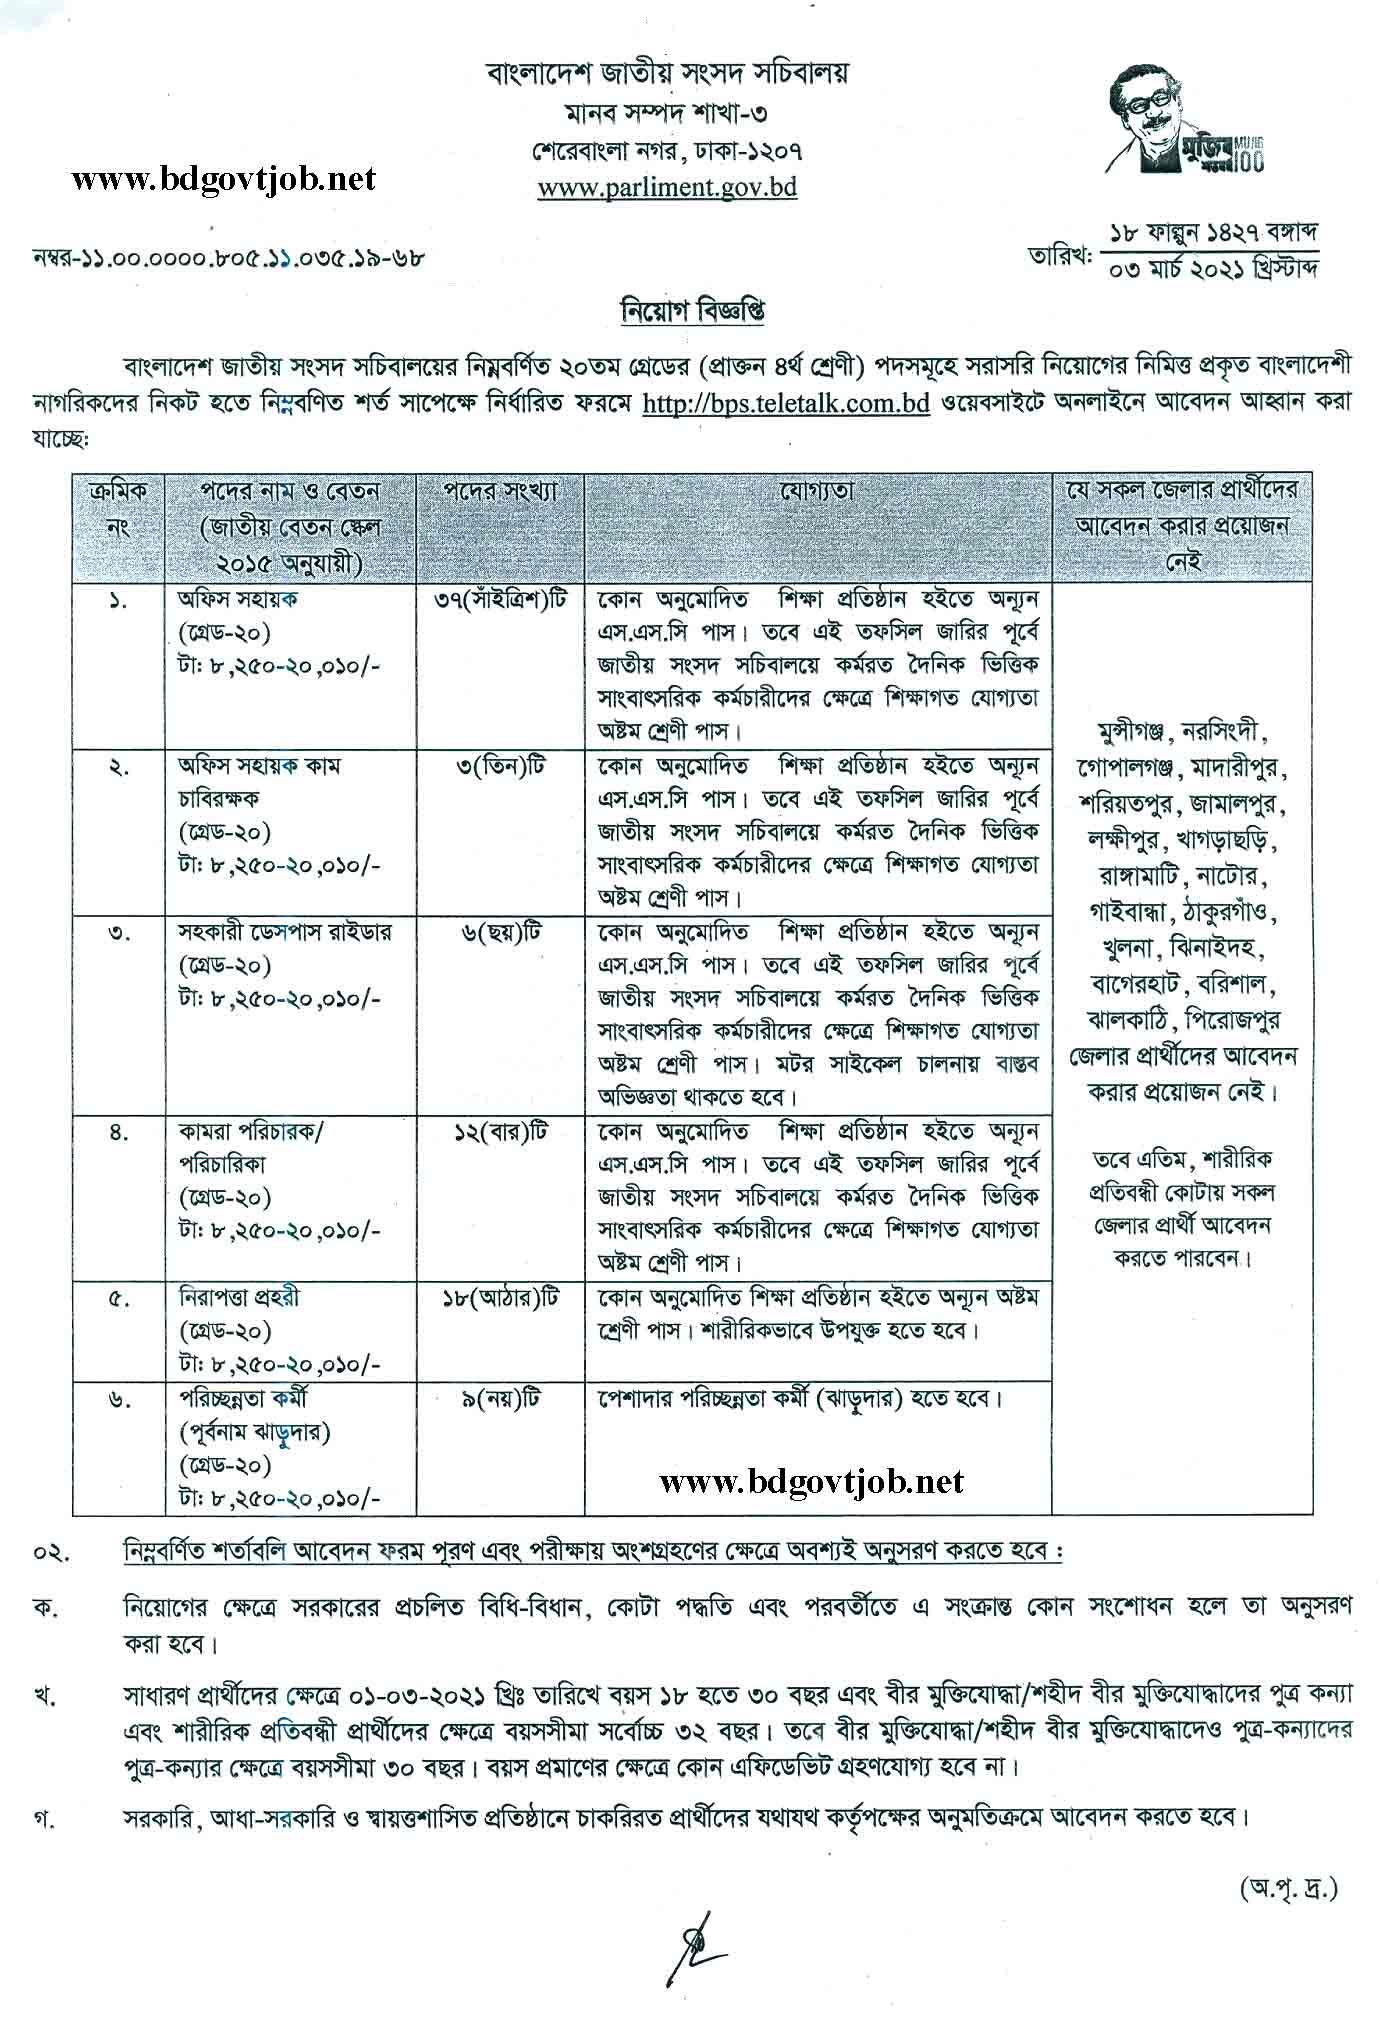 Bangladesh Parliament Job Circular 2021